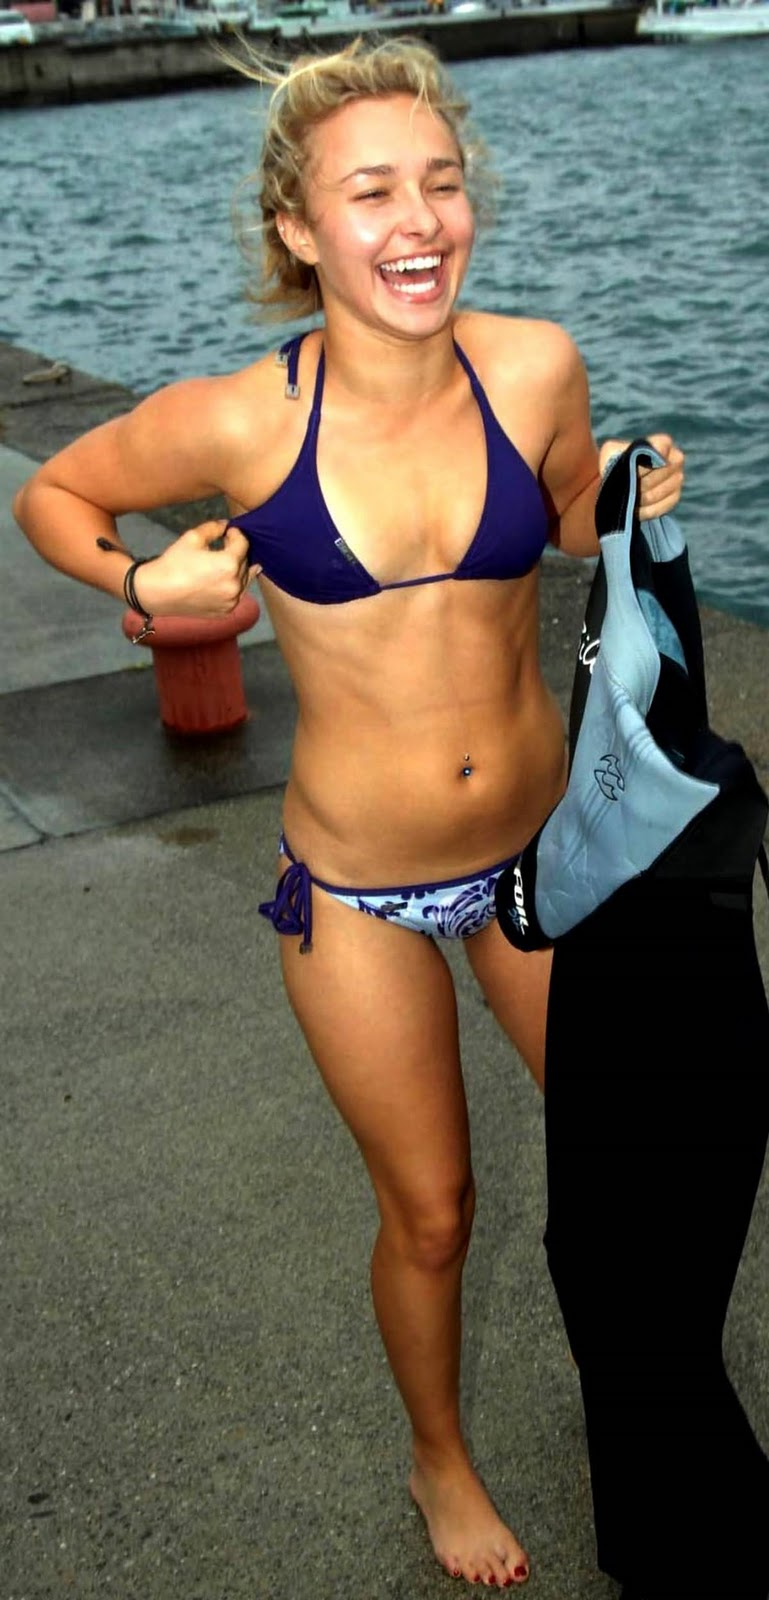 Hayden panttiere sexy pic